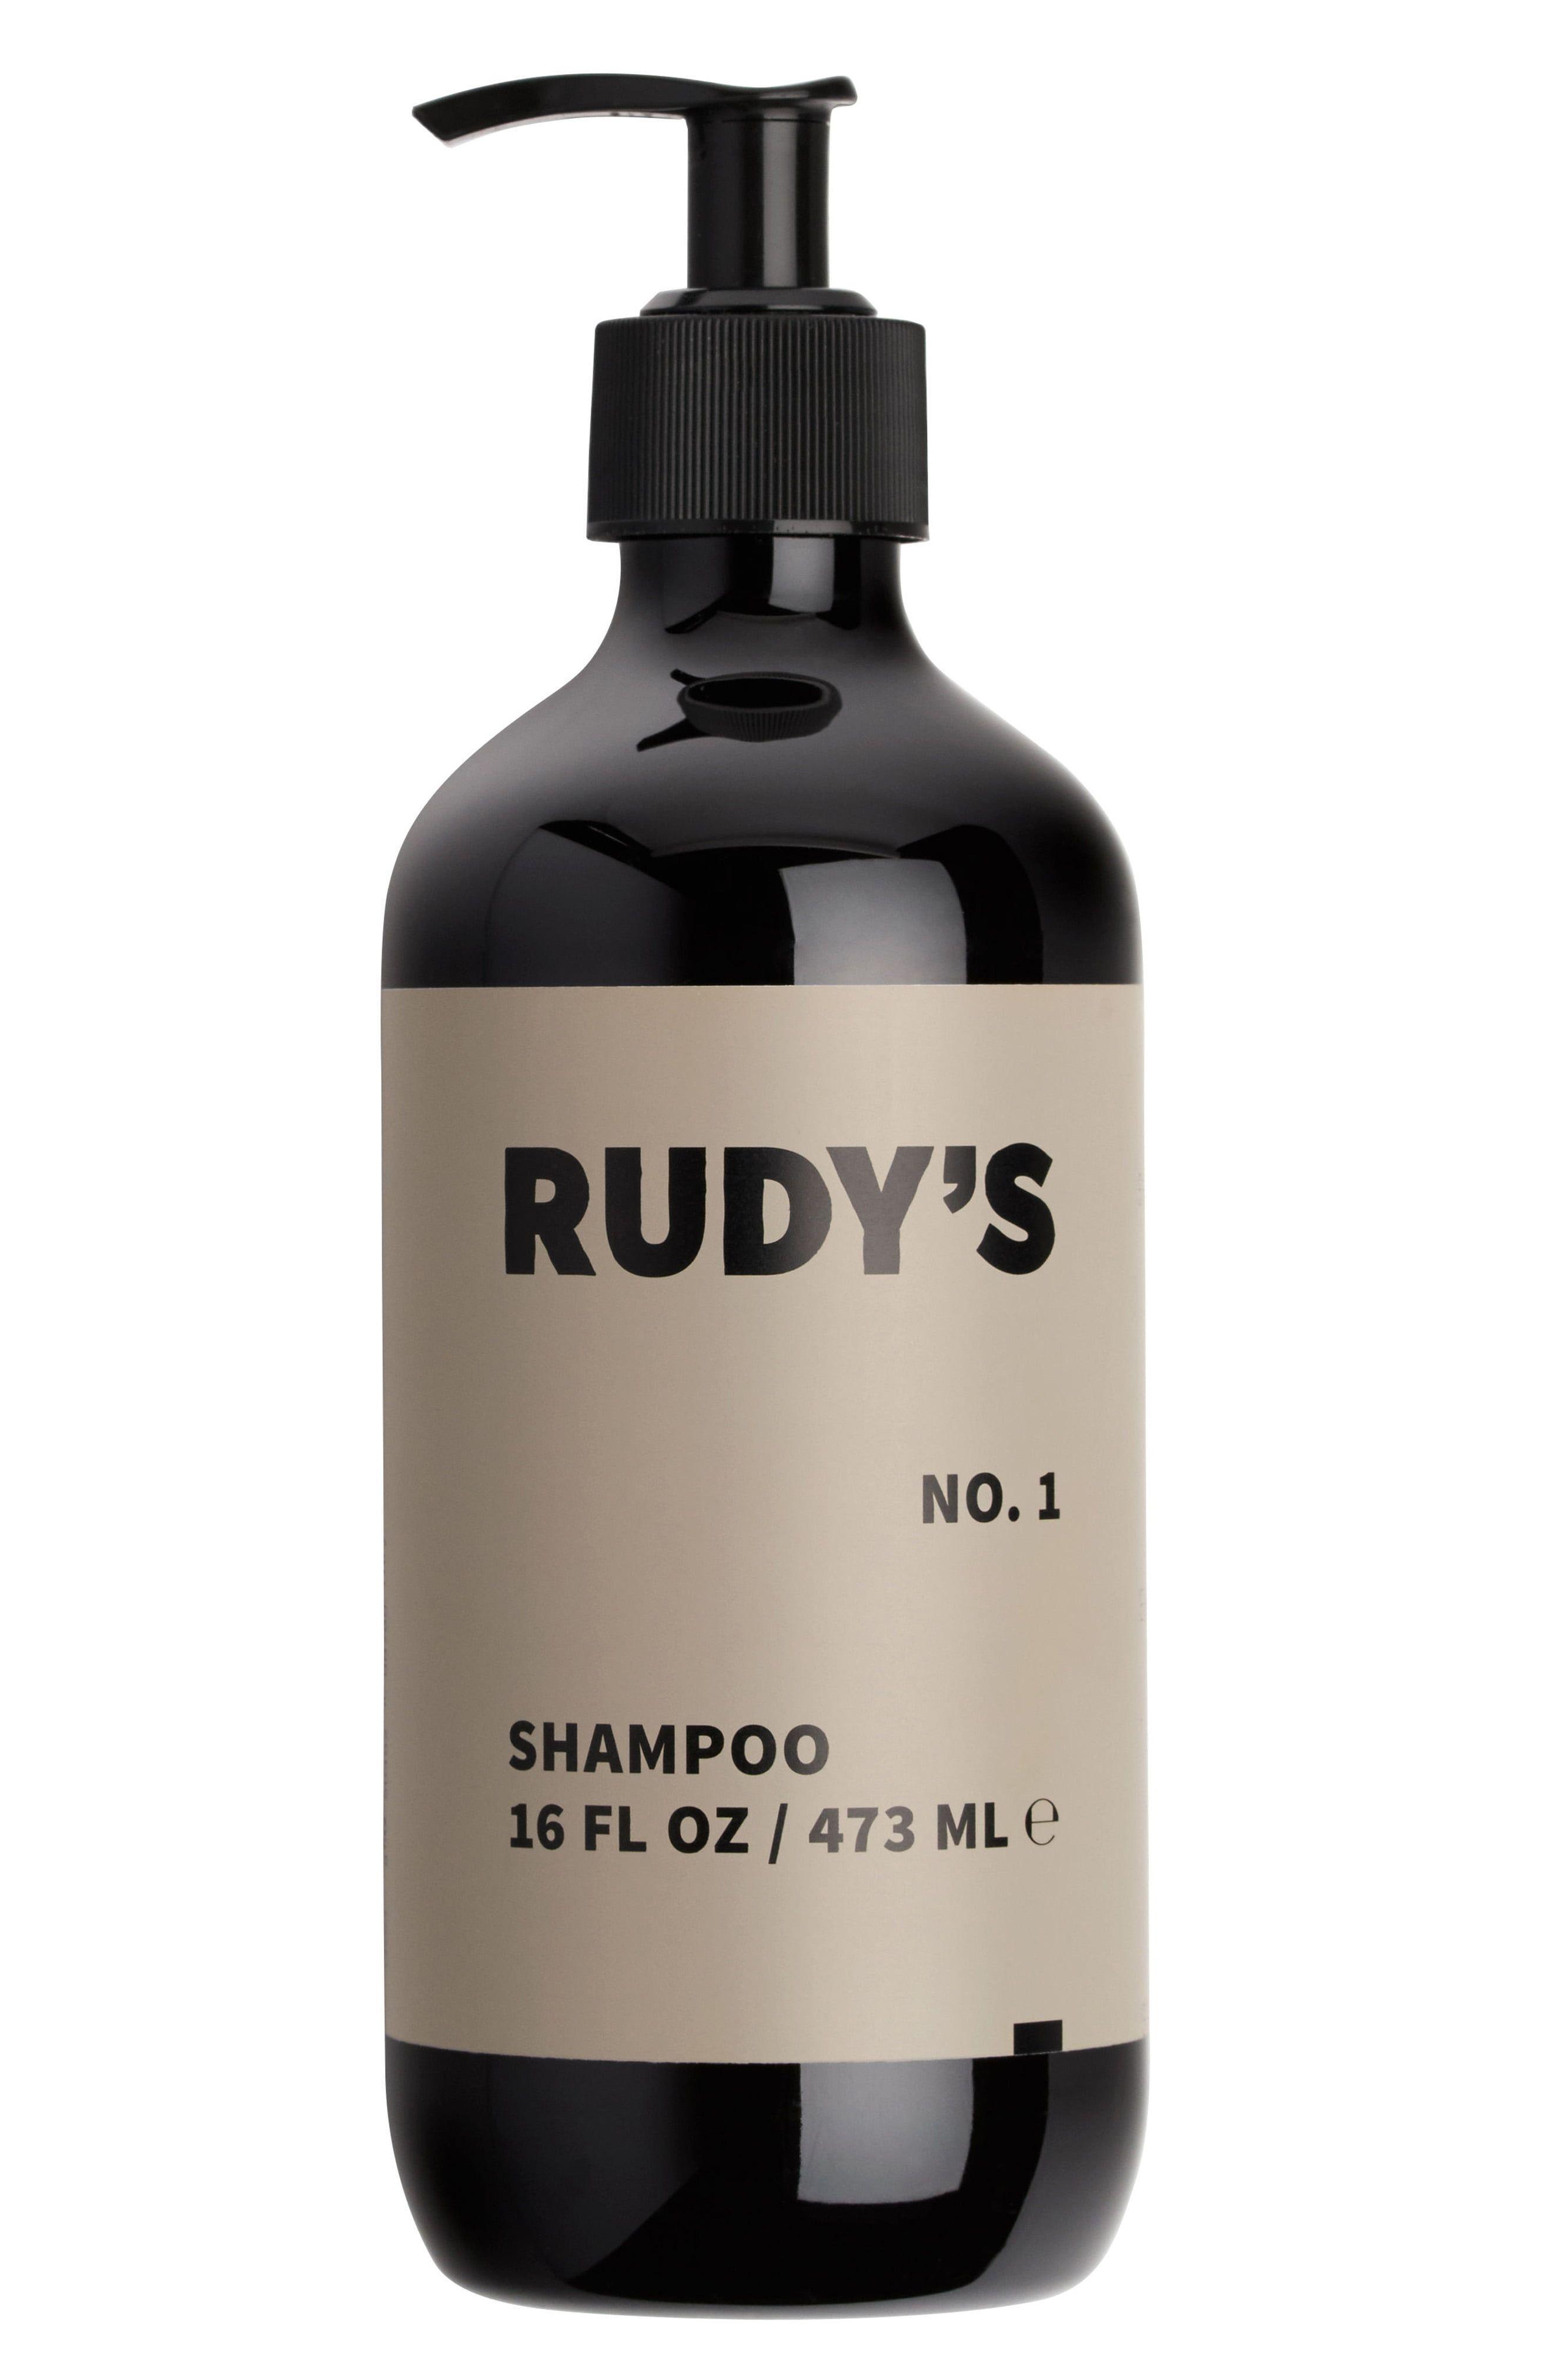 Rudy's No. 1 Shampoo Body wash, Body bars